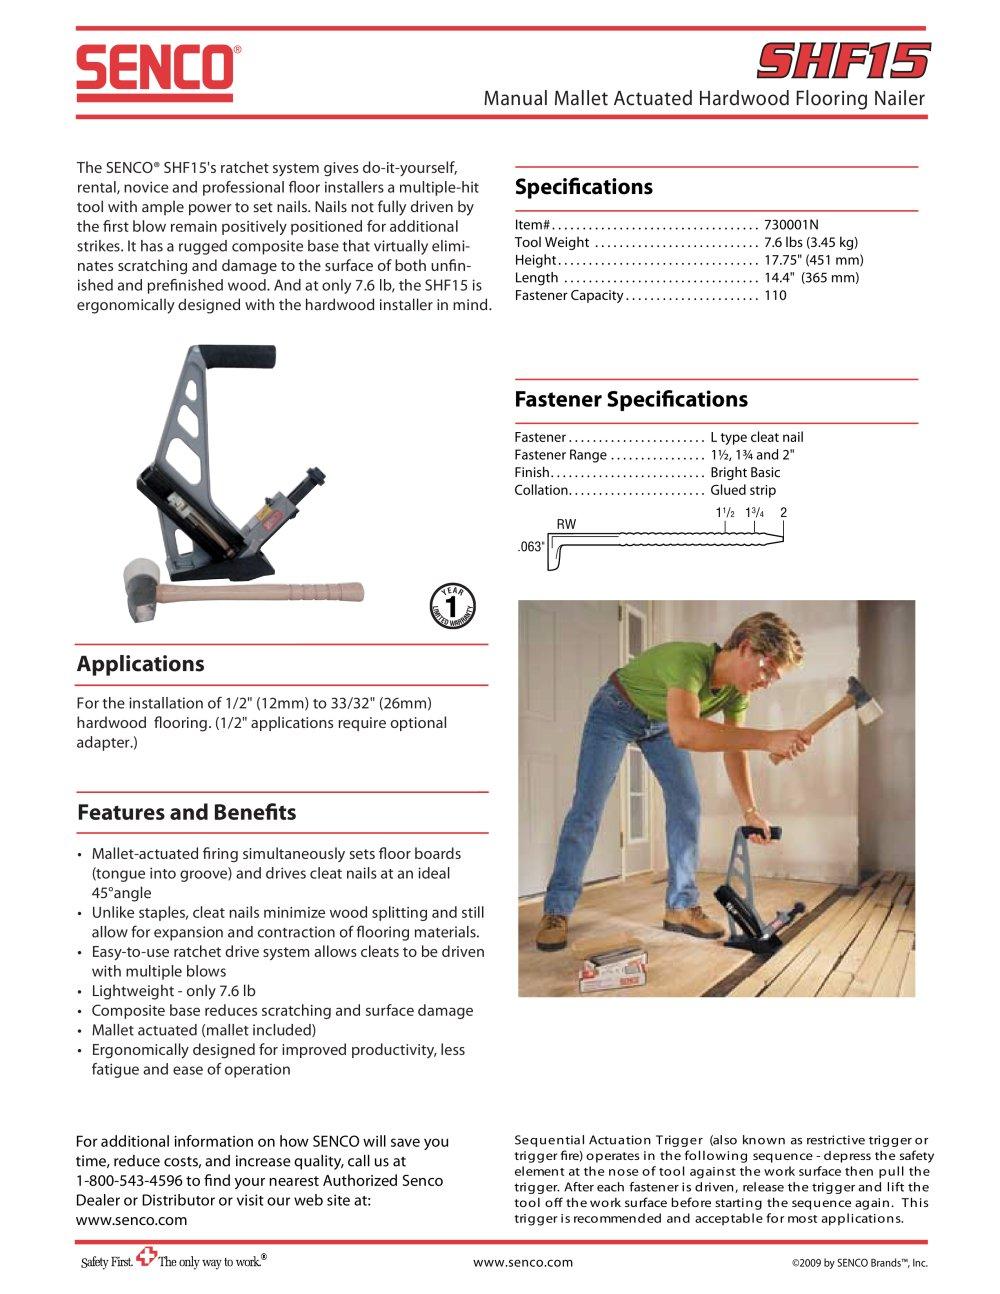 Hardwood Floor Stapler tools accessories highpro tools highpro staplers high pro fs 50 pneumatic flooring stapler Shf15 2 Manual Mallet Actuated Hardwood Flooring Nailer 1 1 Pages